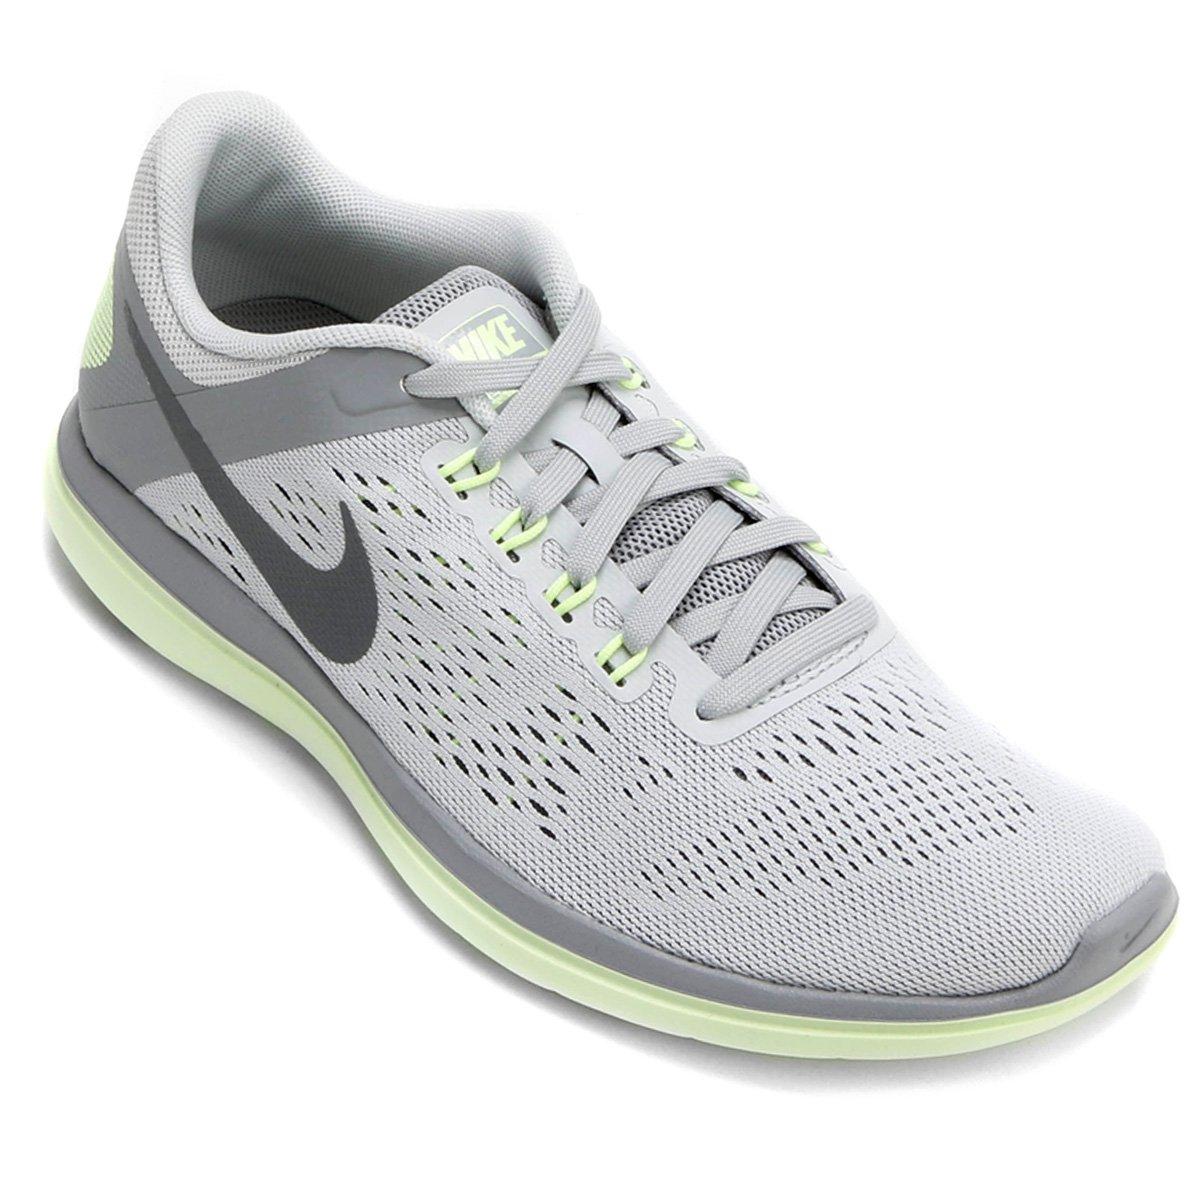 8f144fbf2c933 Tênis Nike Flex 2016 RN Feminino - Compre Agora